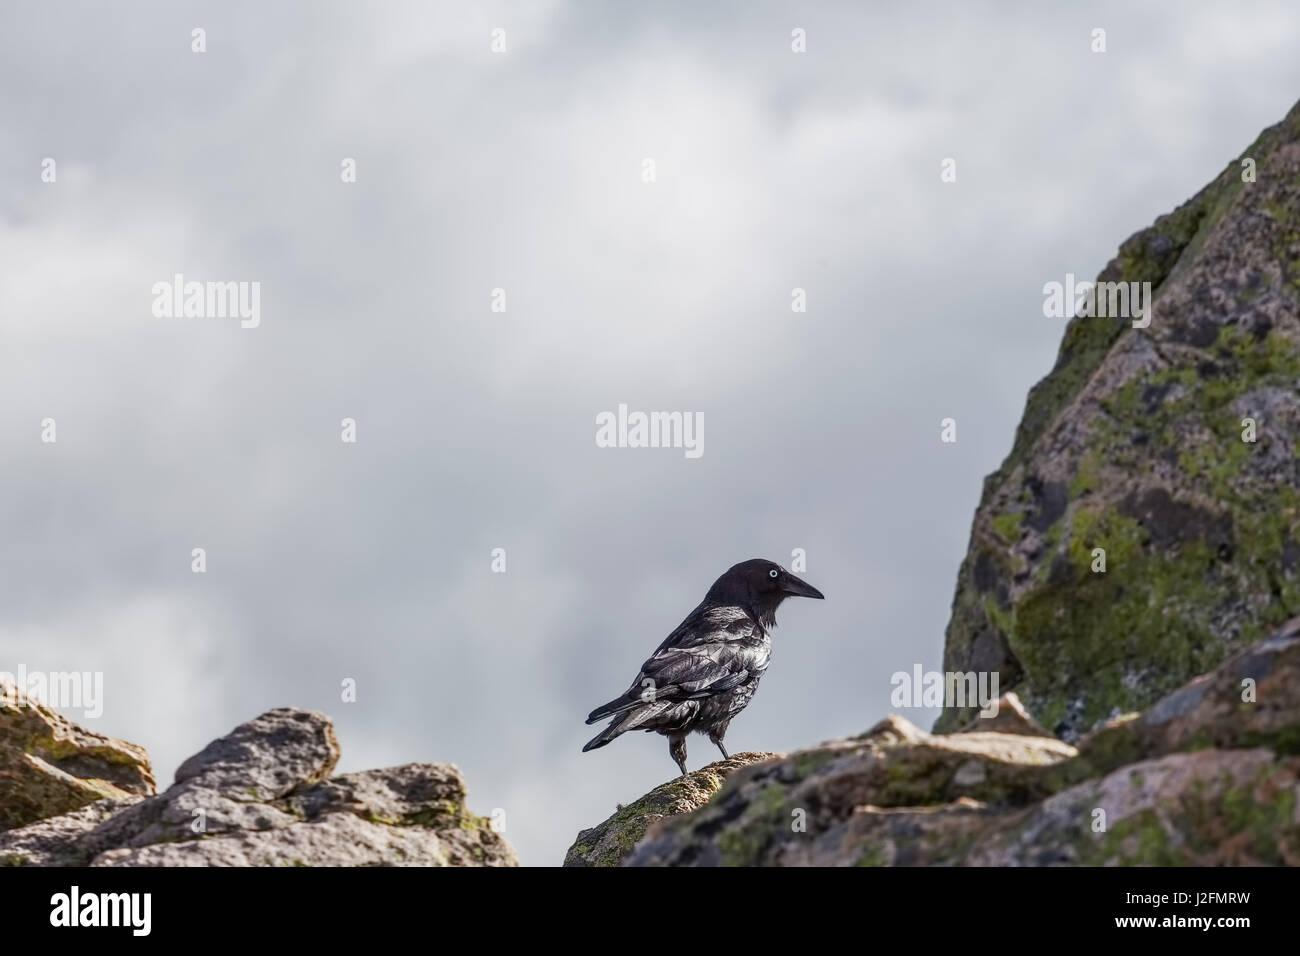 Australian Raven - portrait with copy space - Stock Image